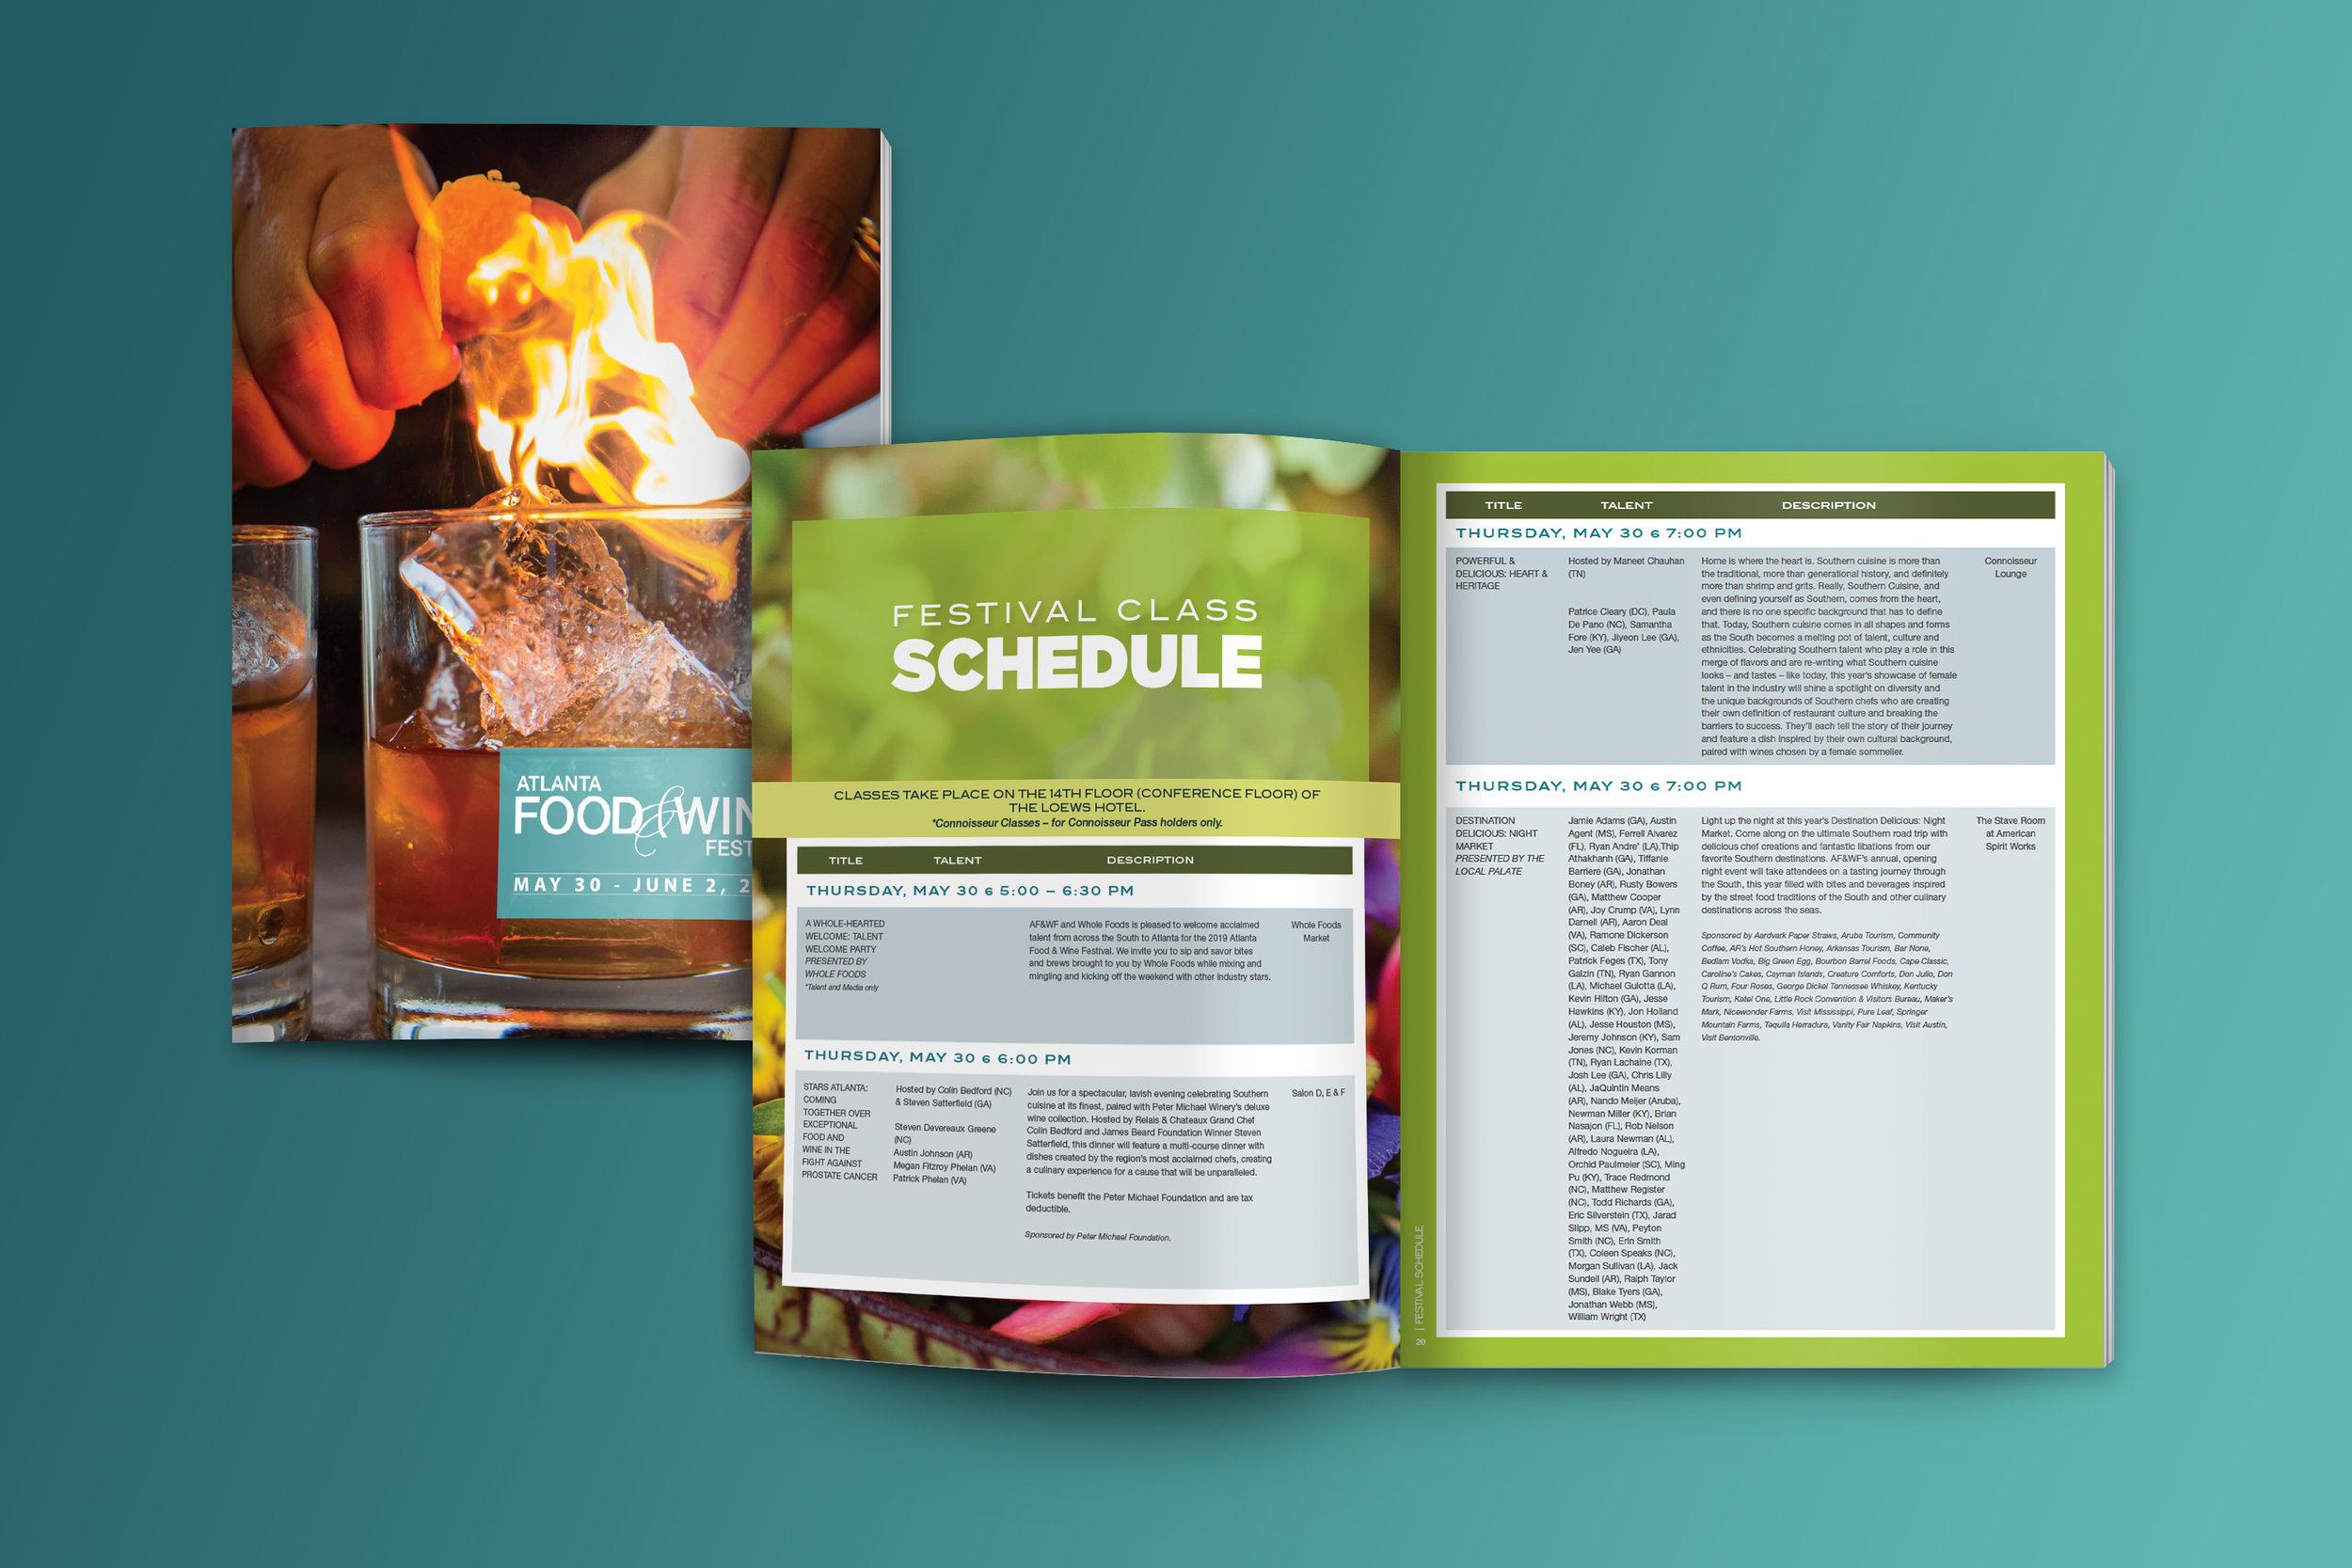 Program guide for Atlanta Food & Wine Festival